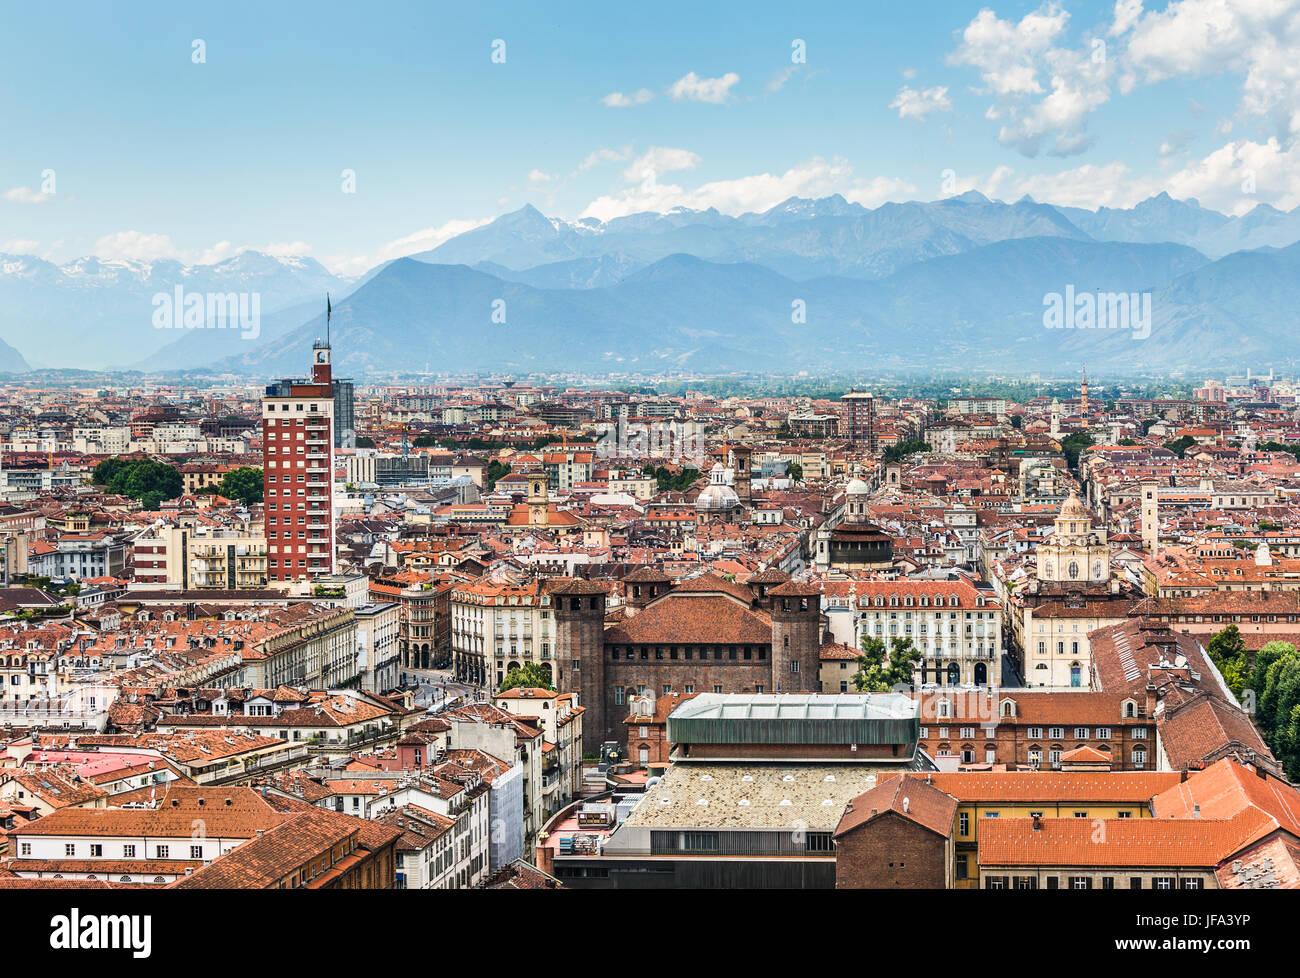 Vista aérea de Turín, Turín, Italia Foto de stock